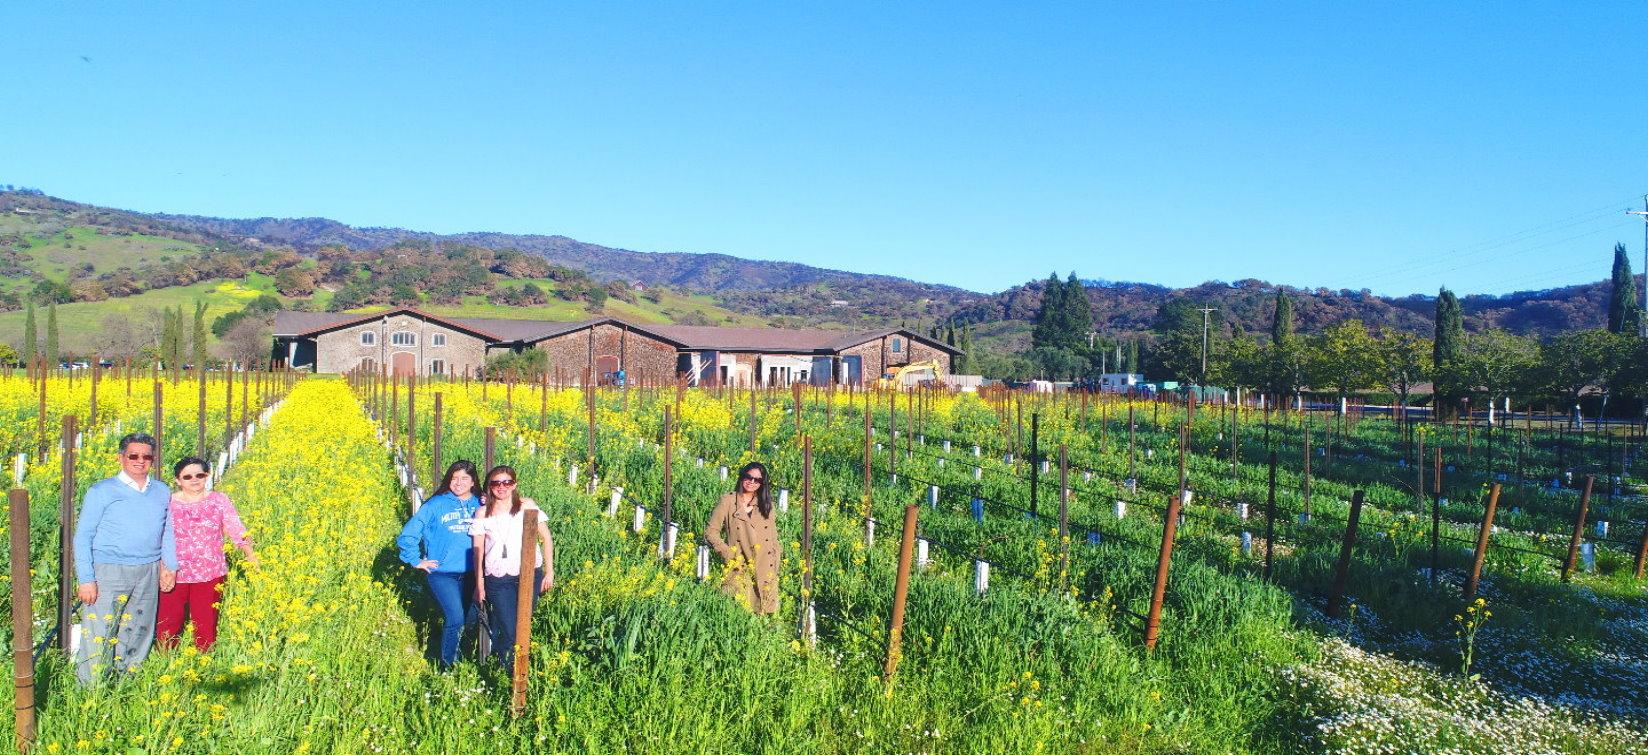 Mendo-Wine-Tours-Taste-Tour-the-Mendocino-Anderson